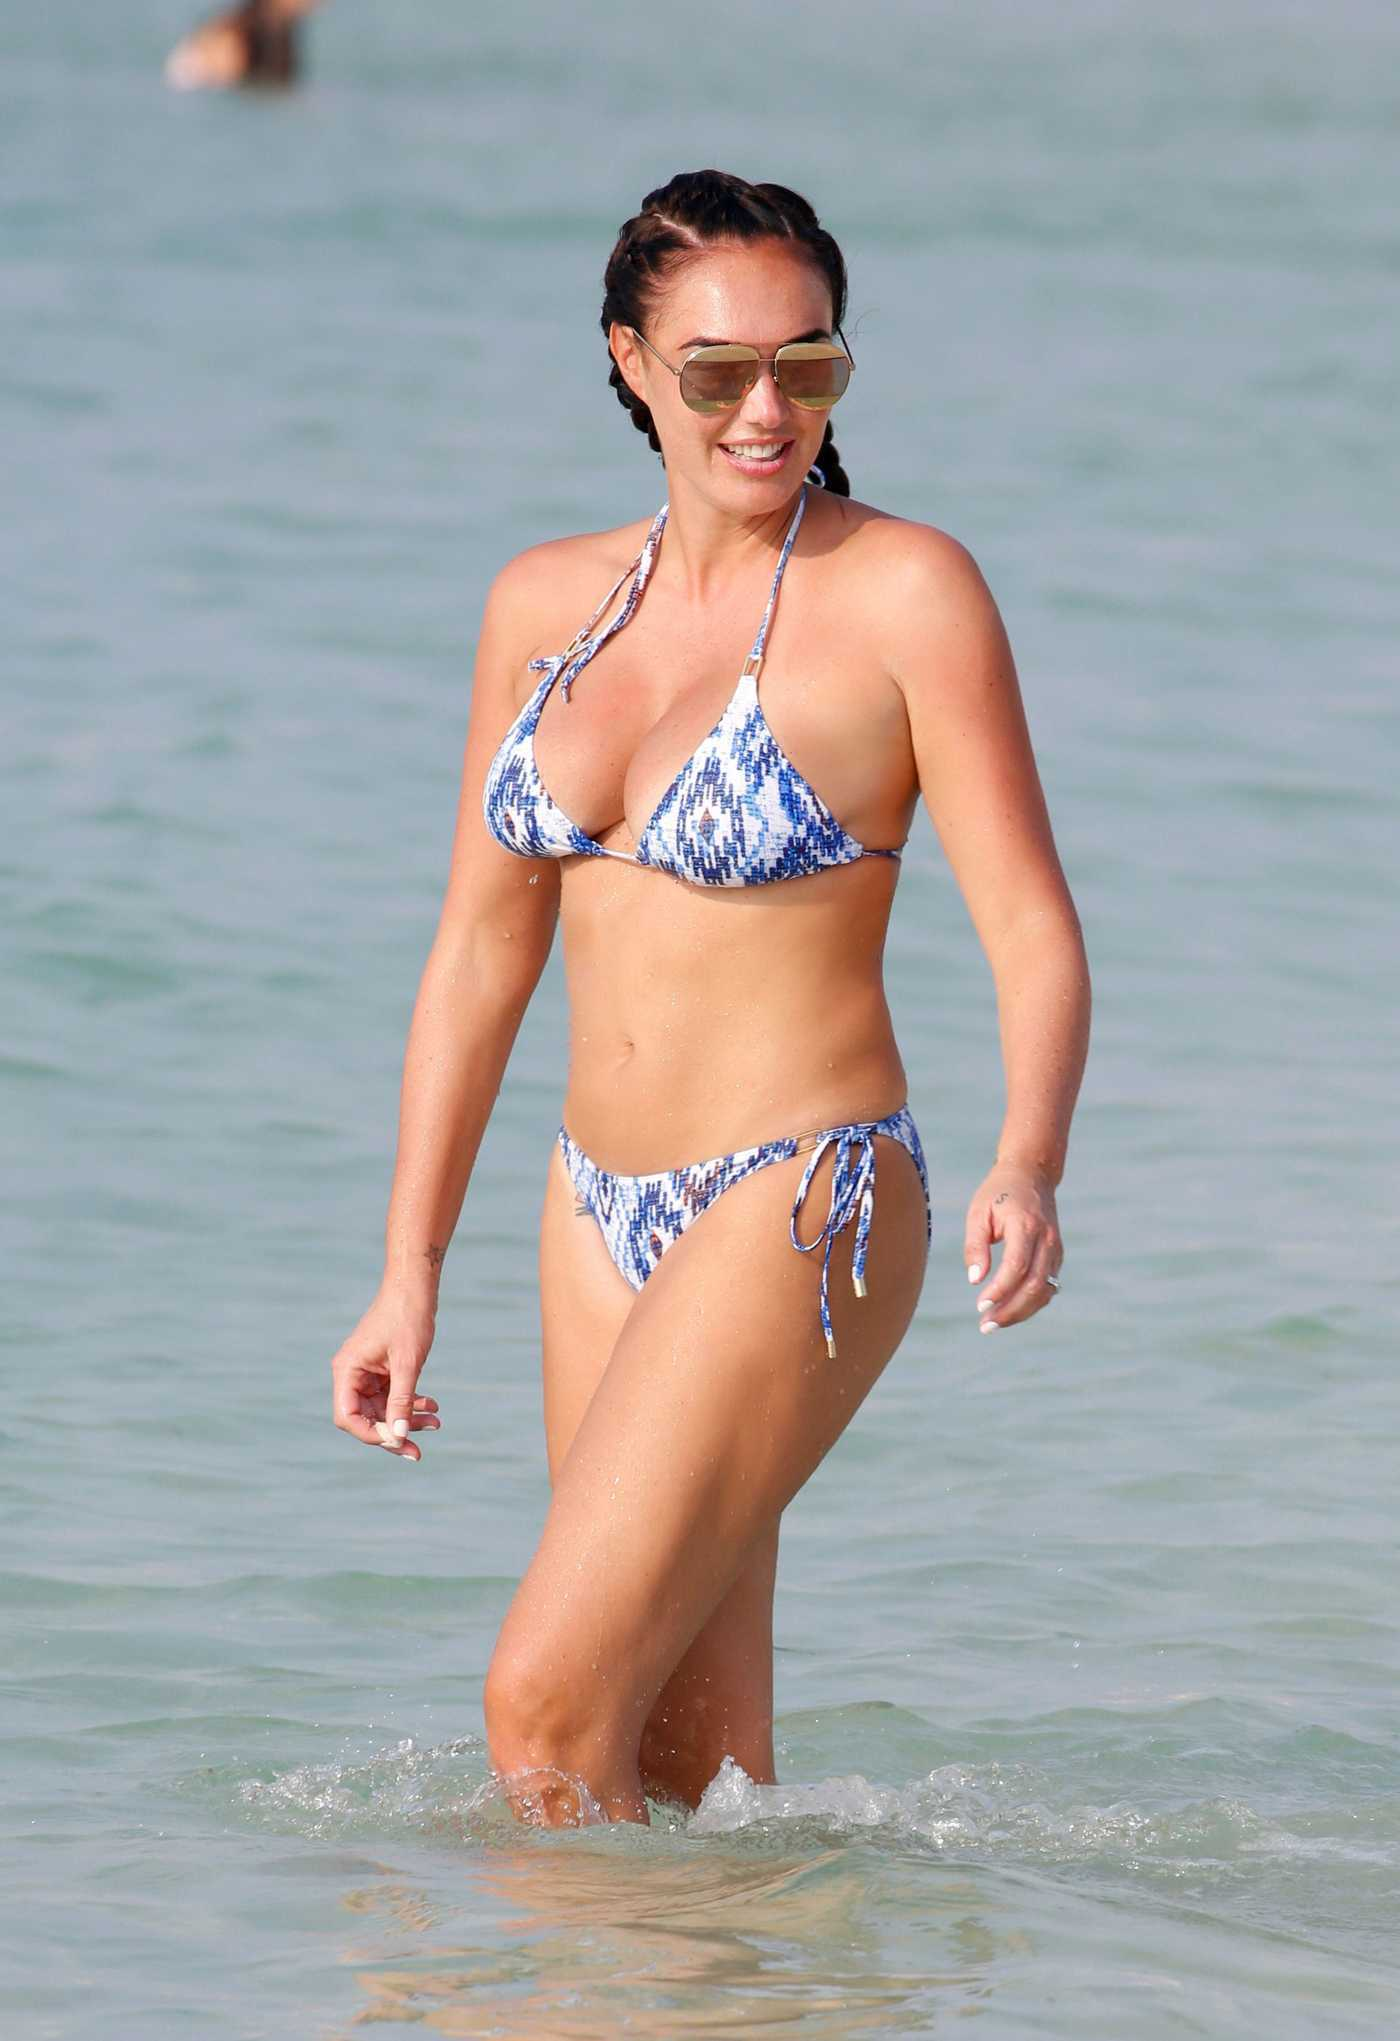 Tamara Ecclestone in Bikini at the Beach in Dubai 10/27/2016